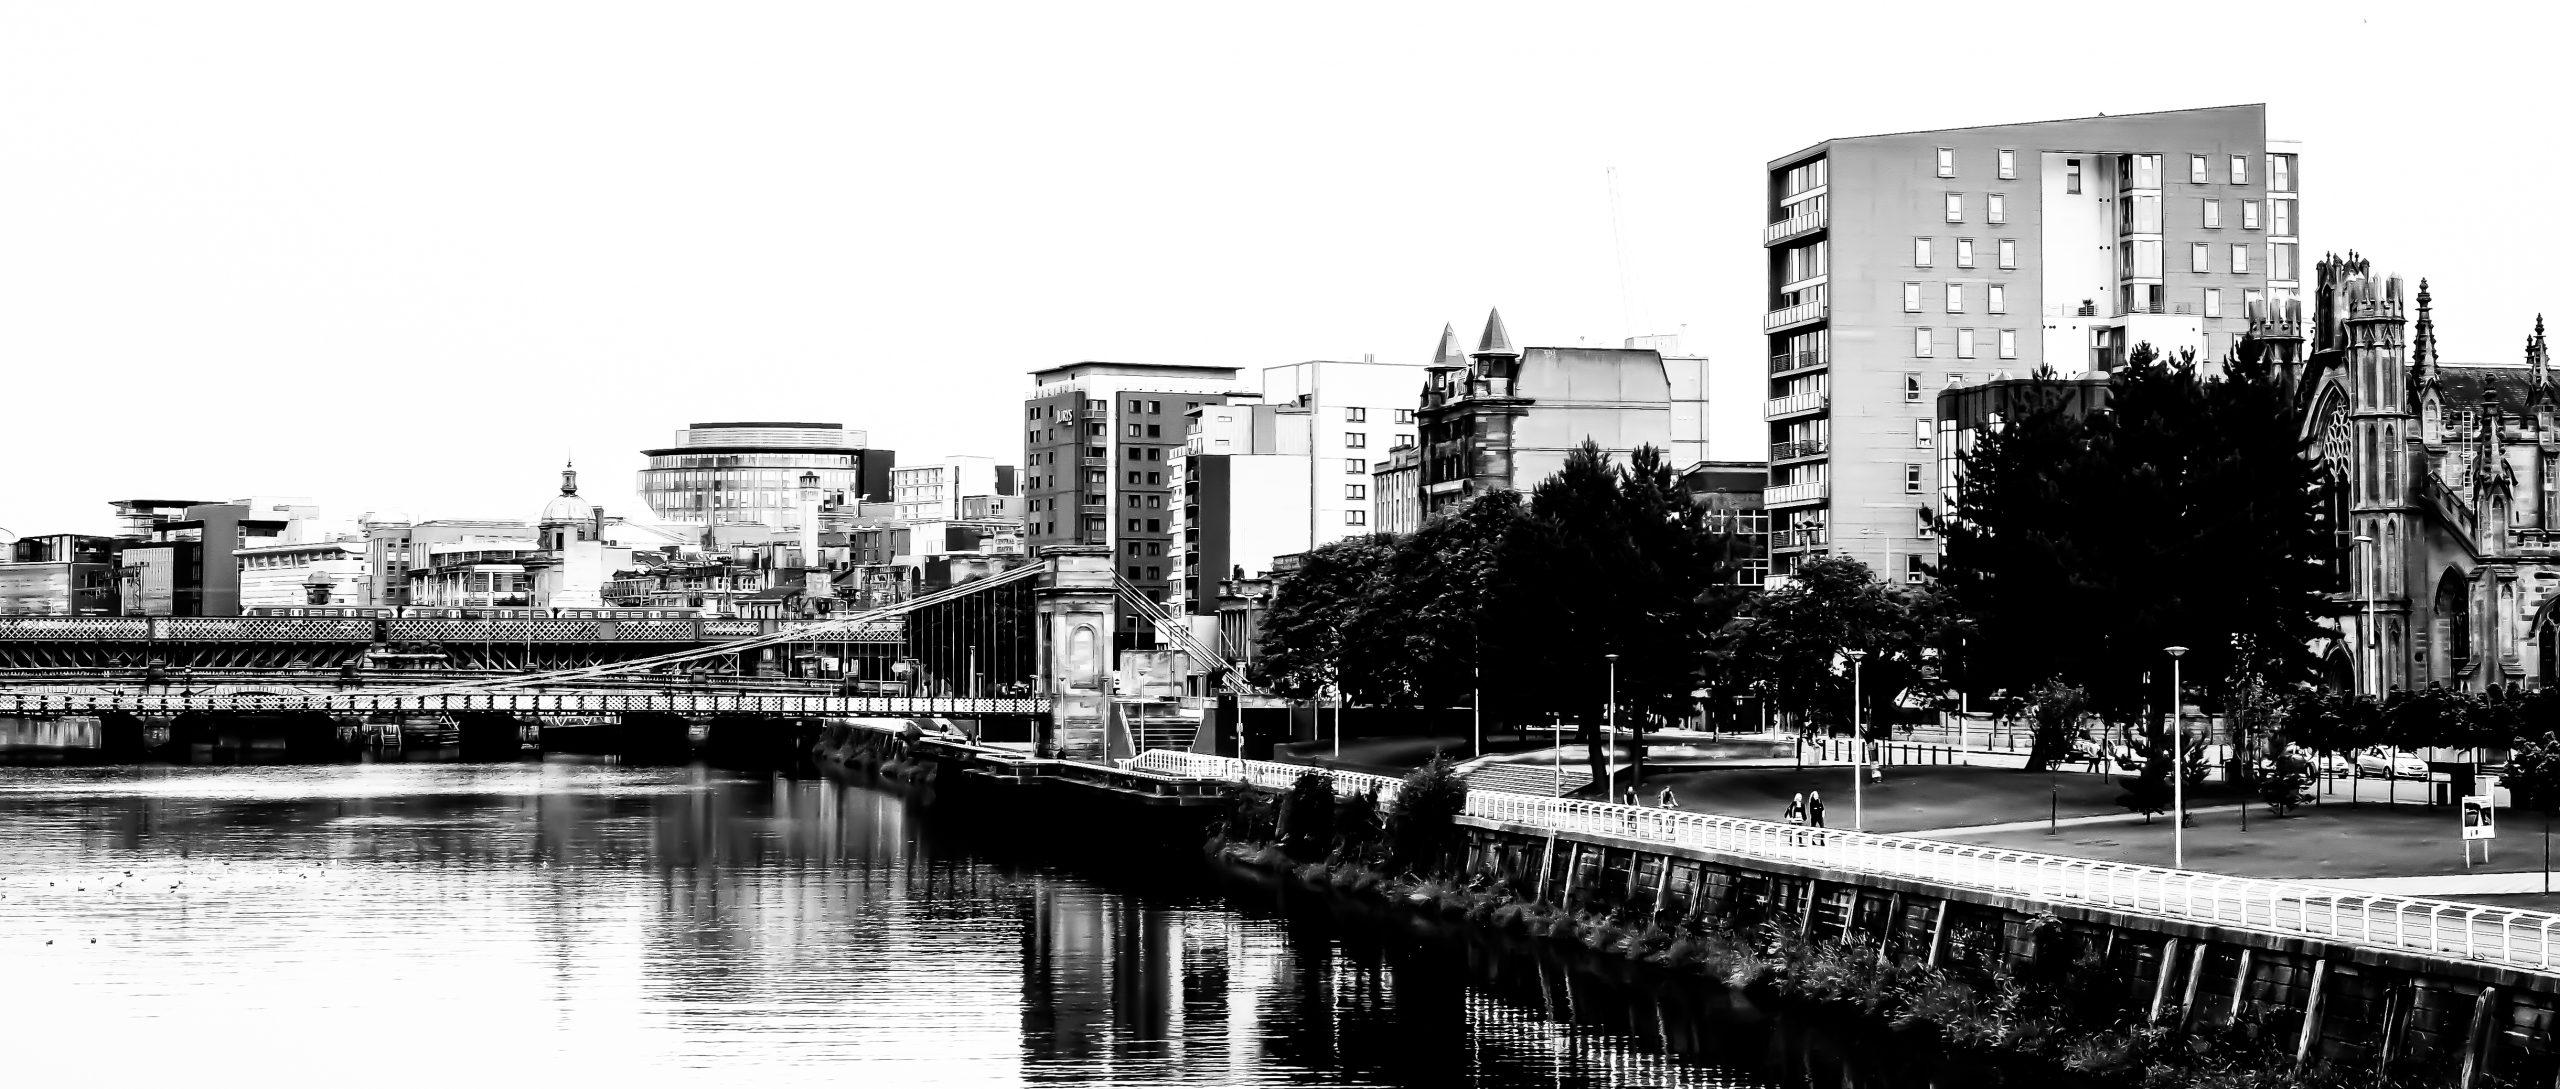 Glasgow From The Bridge